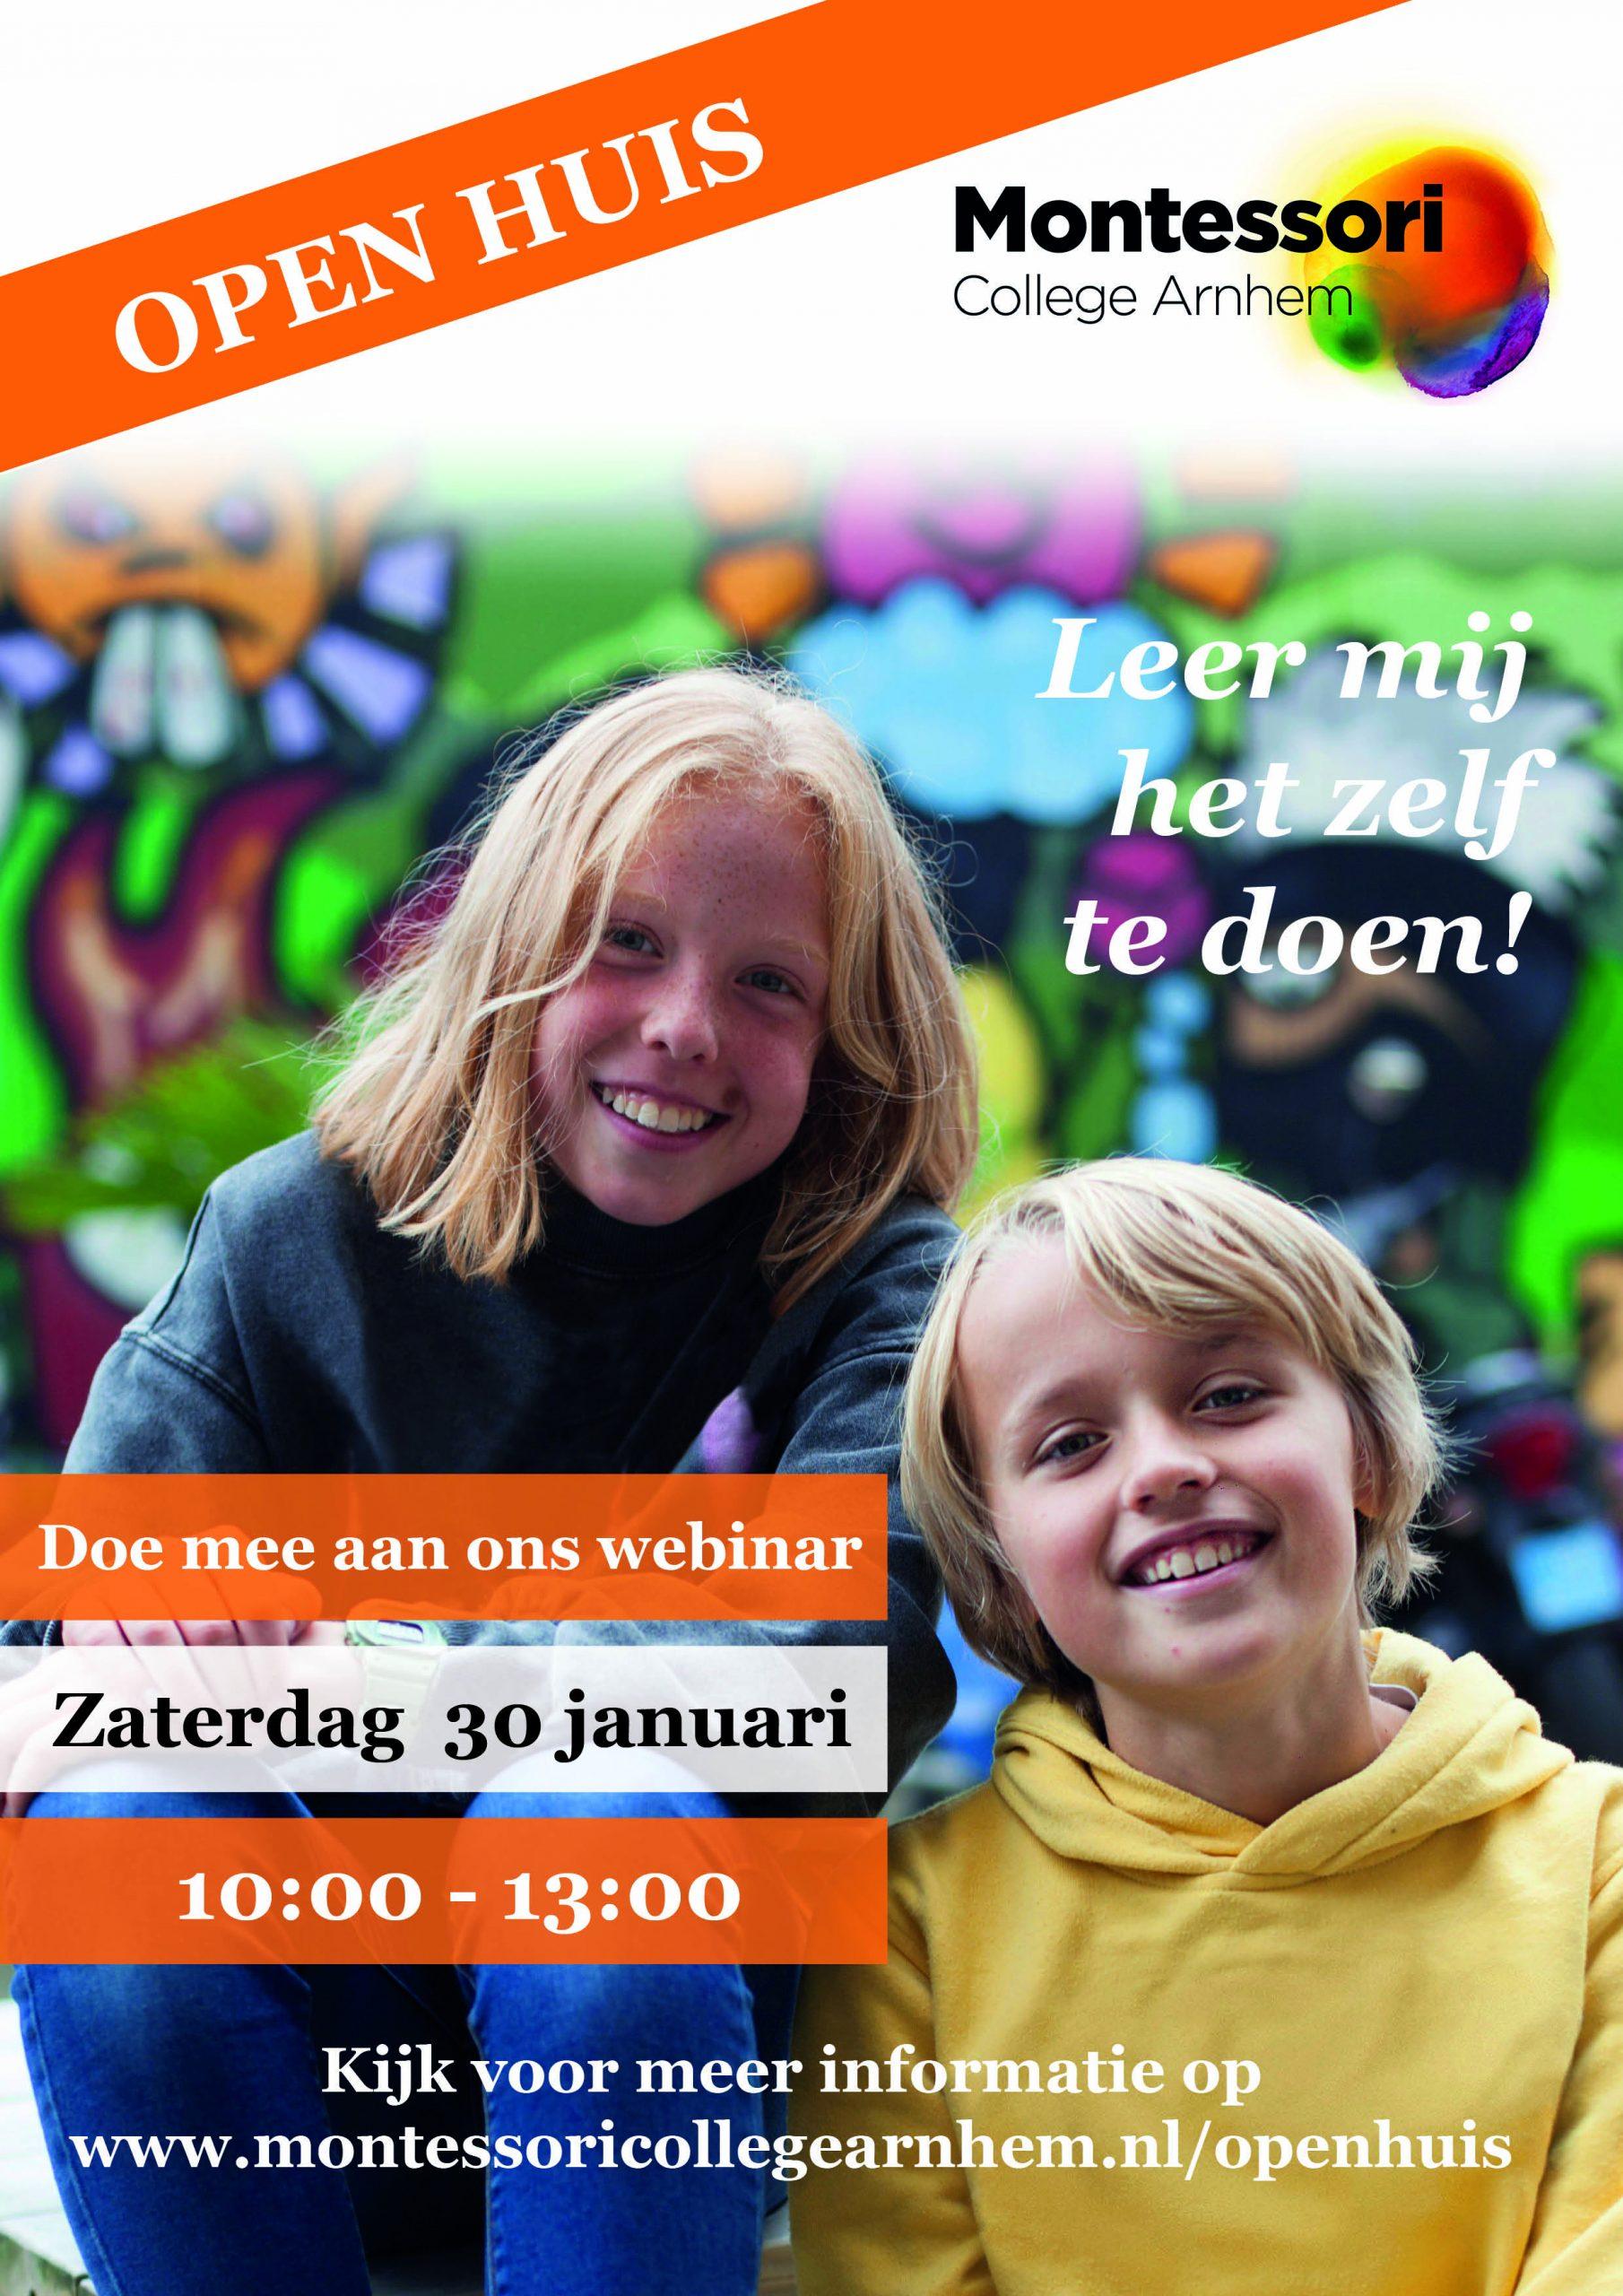 Online Open Huis Montessori College